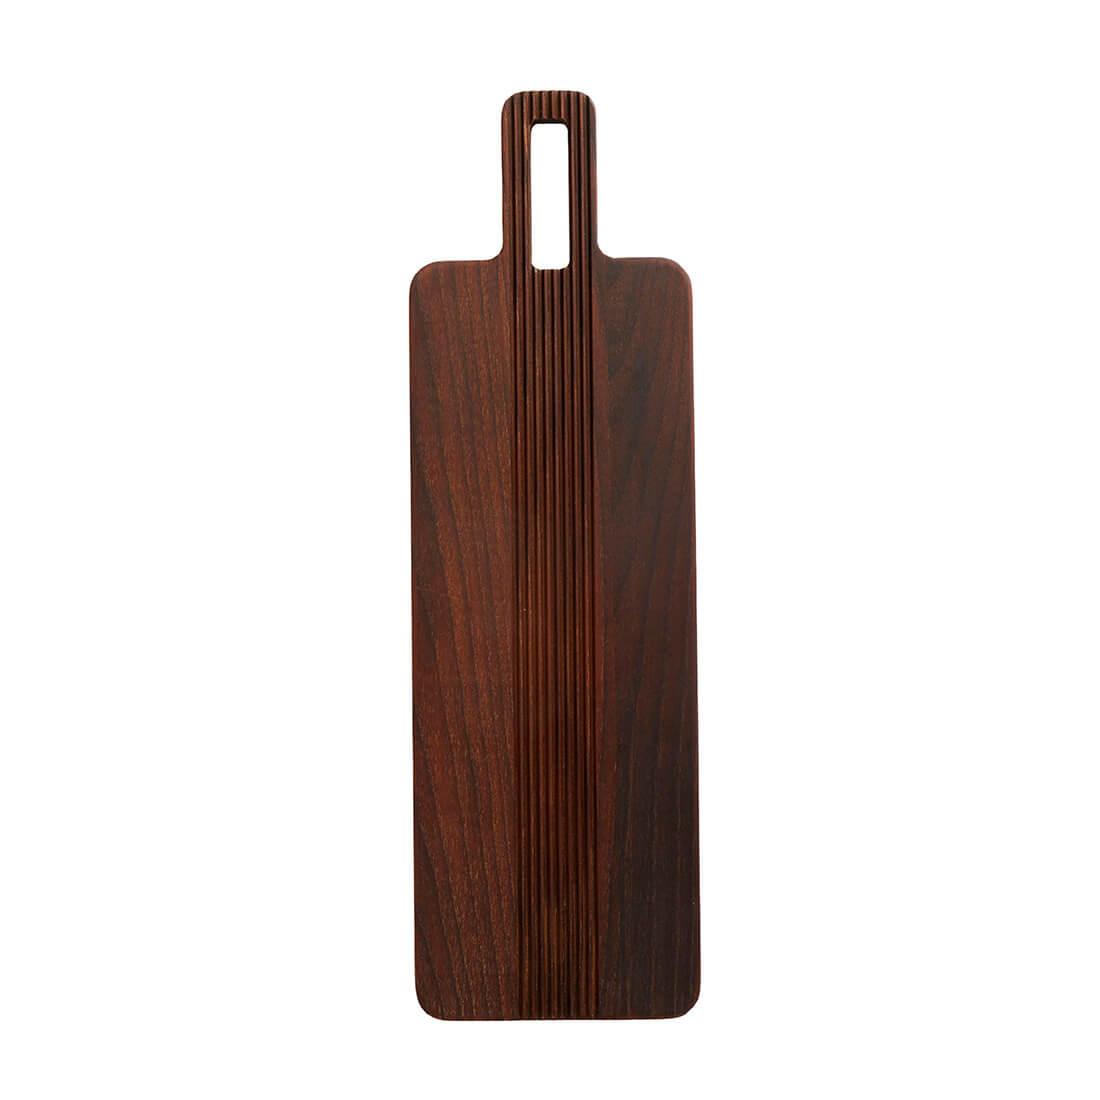 Muubs Yami tapasbræt, brun